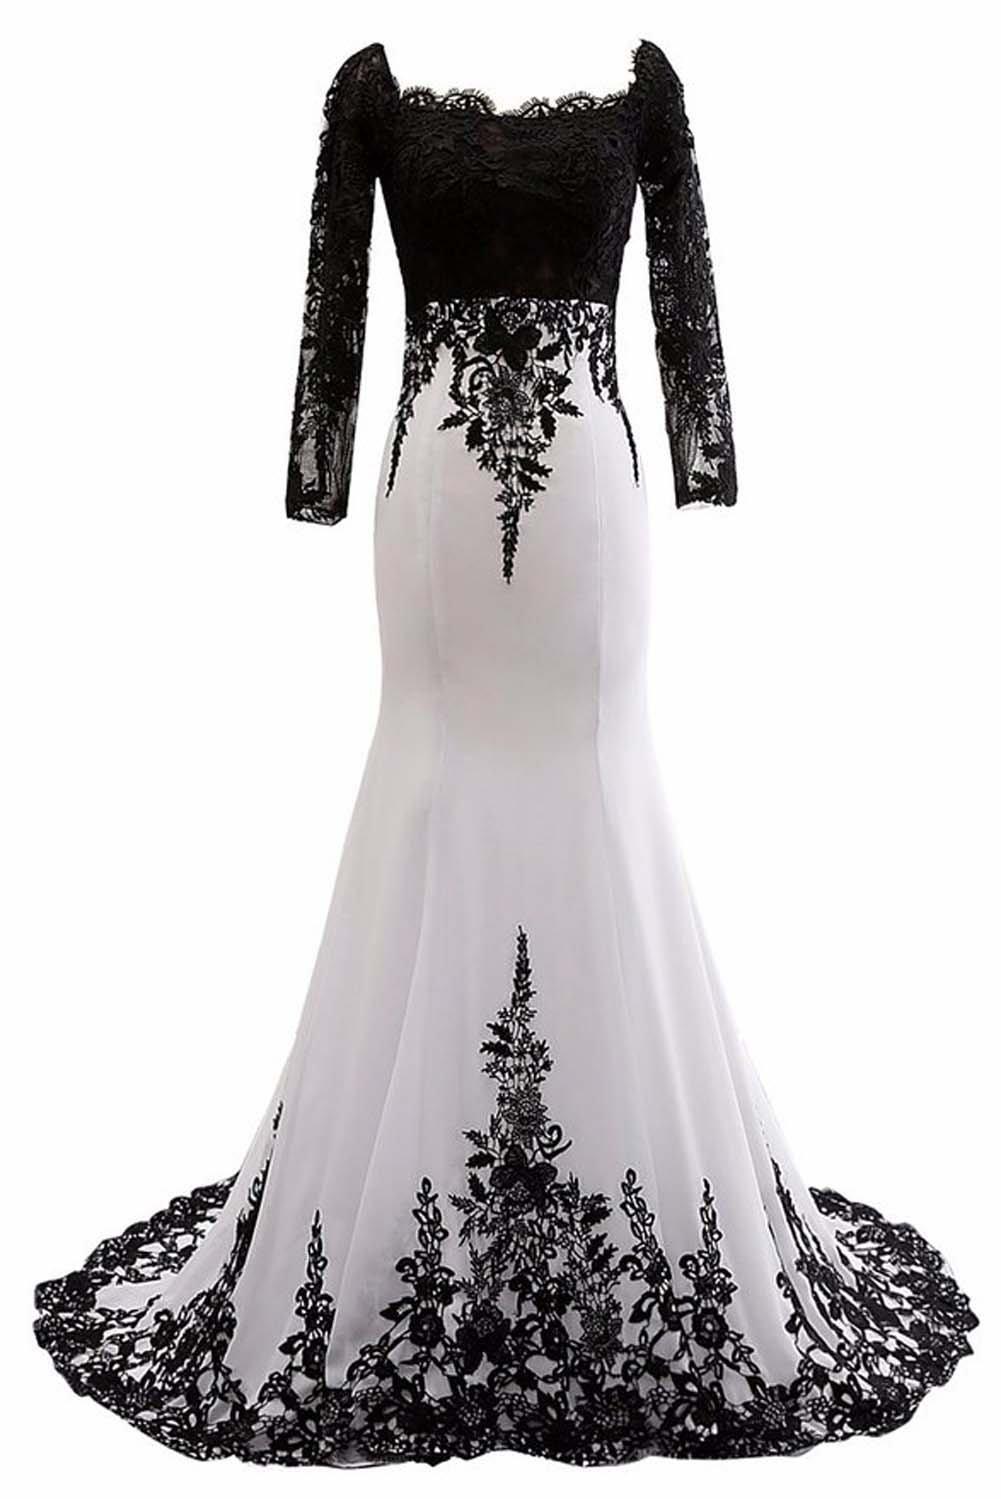 4115096ecf7a Ruiyuhong Women's Lace Long Sleeve Evening Dresses Mermaid Party Gowns LH18